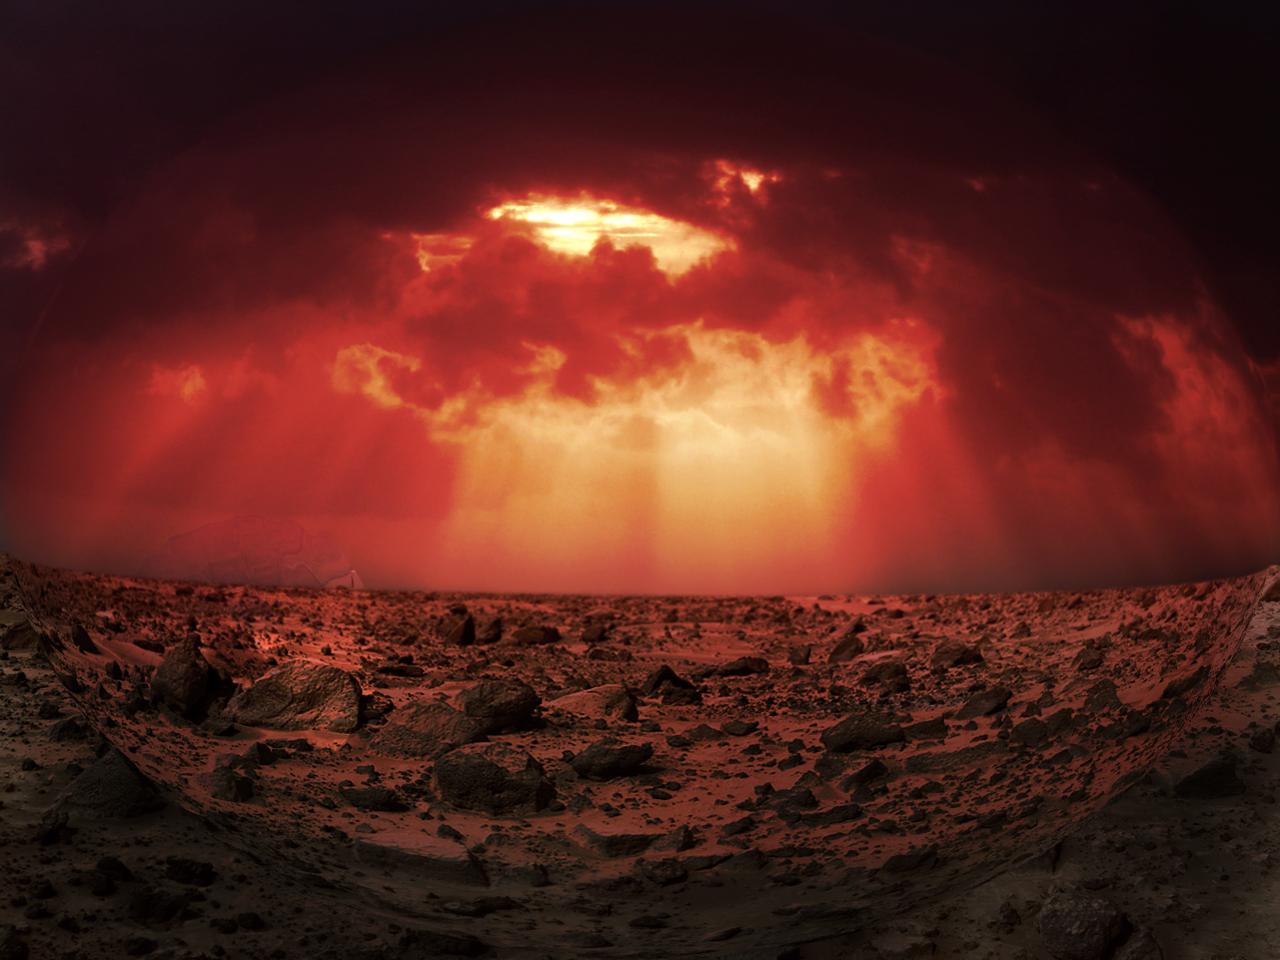 Sunset on mars photo mars sunset by drmctchr - Mars sunset wallpaper ...